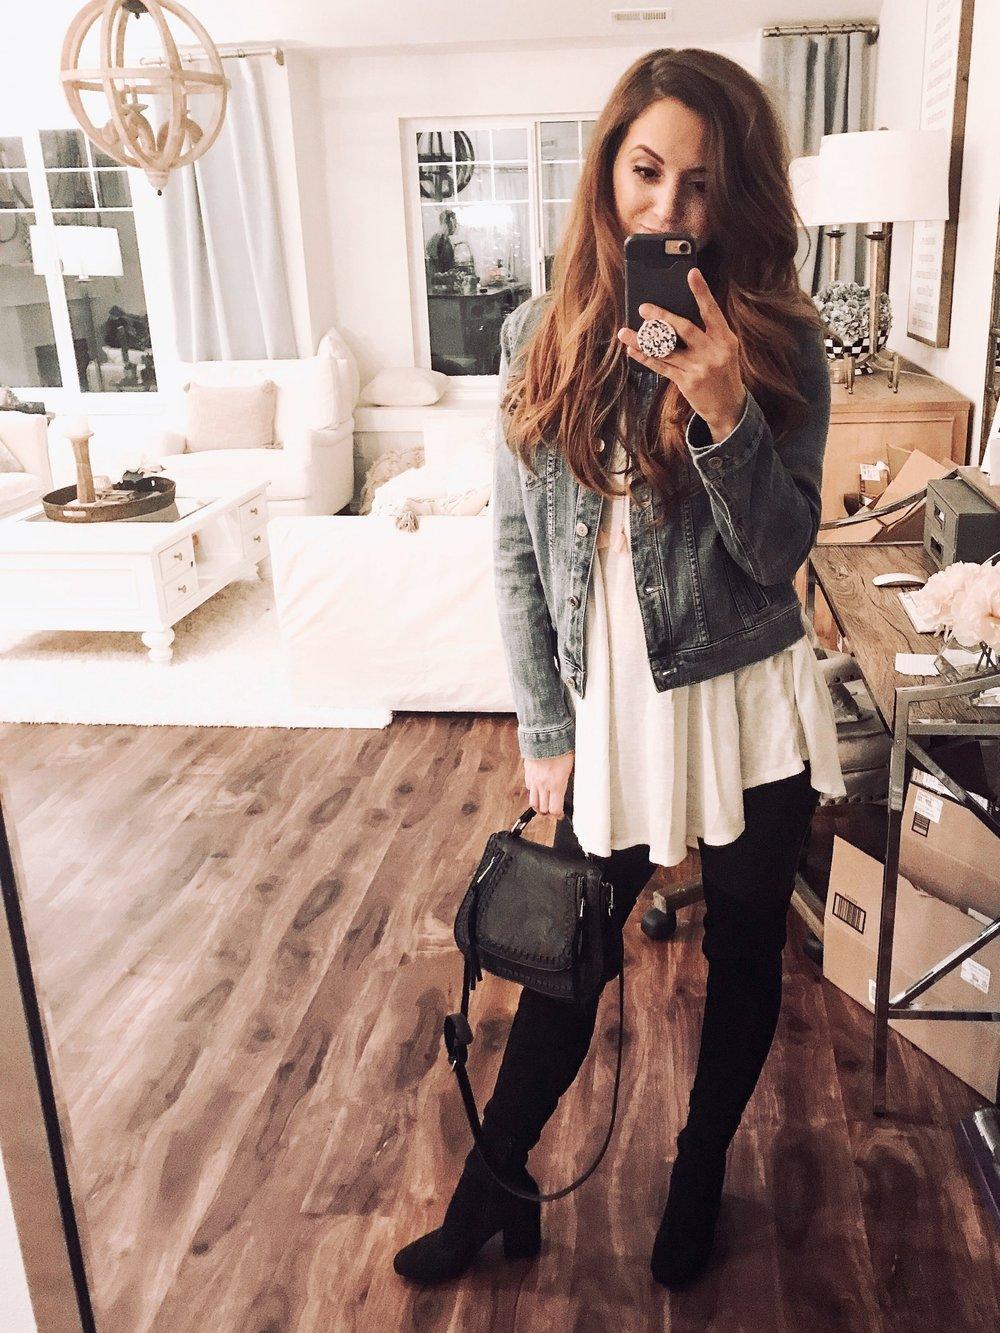 @Houseof5five closet staple - favorite jean jacket